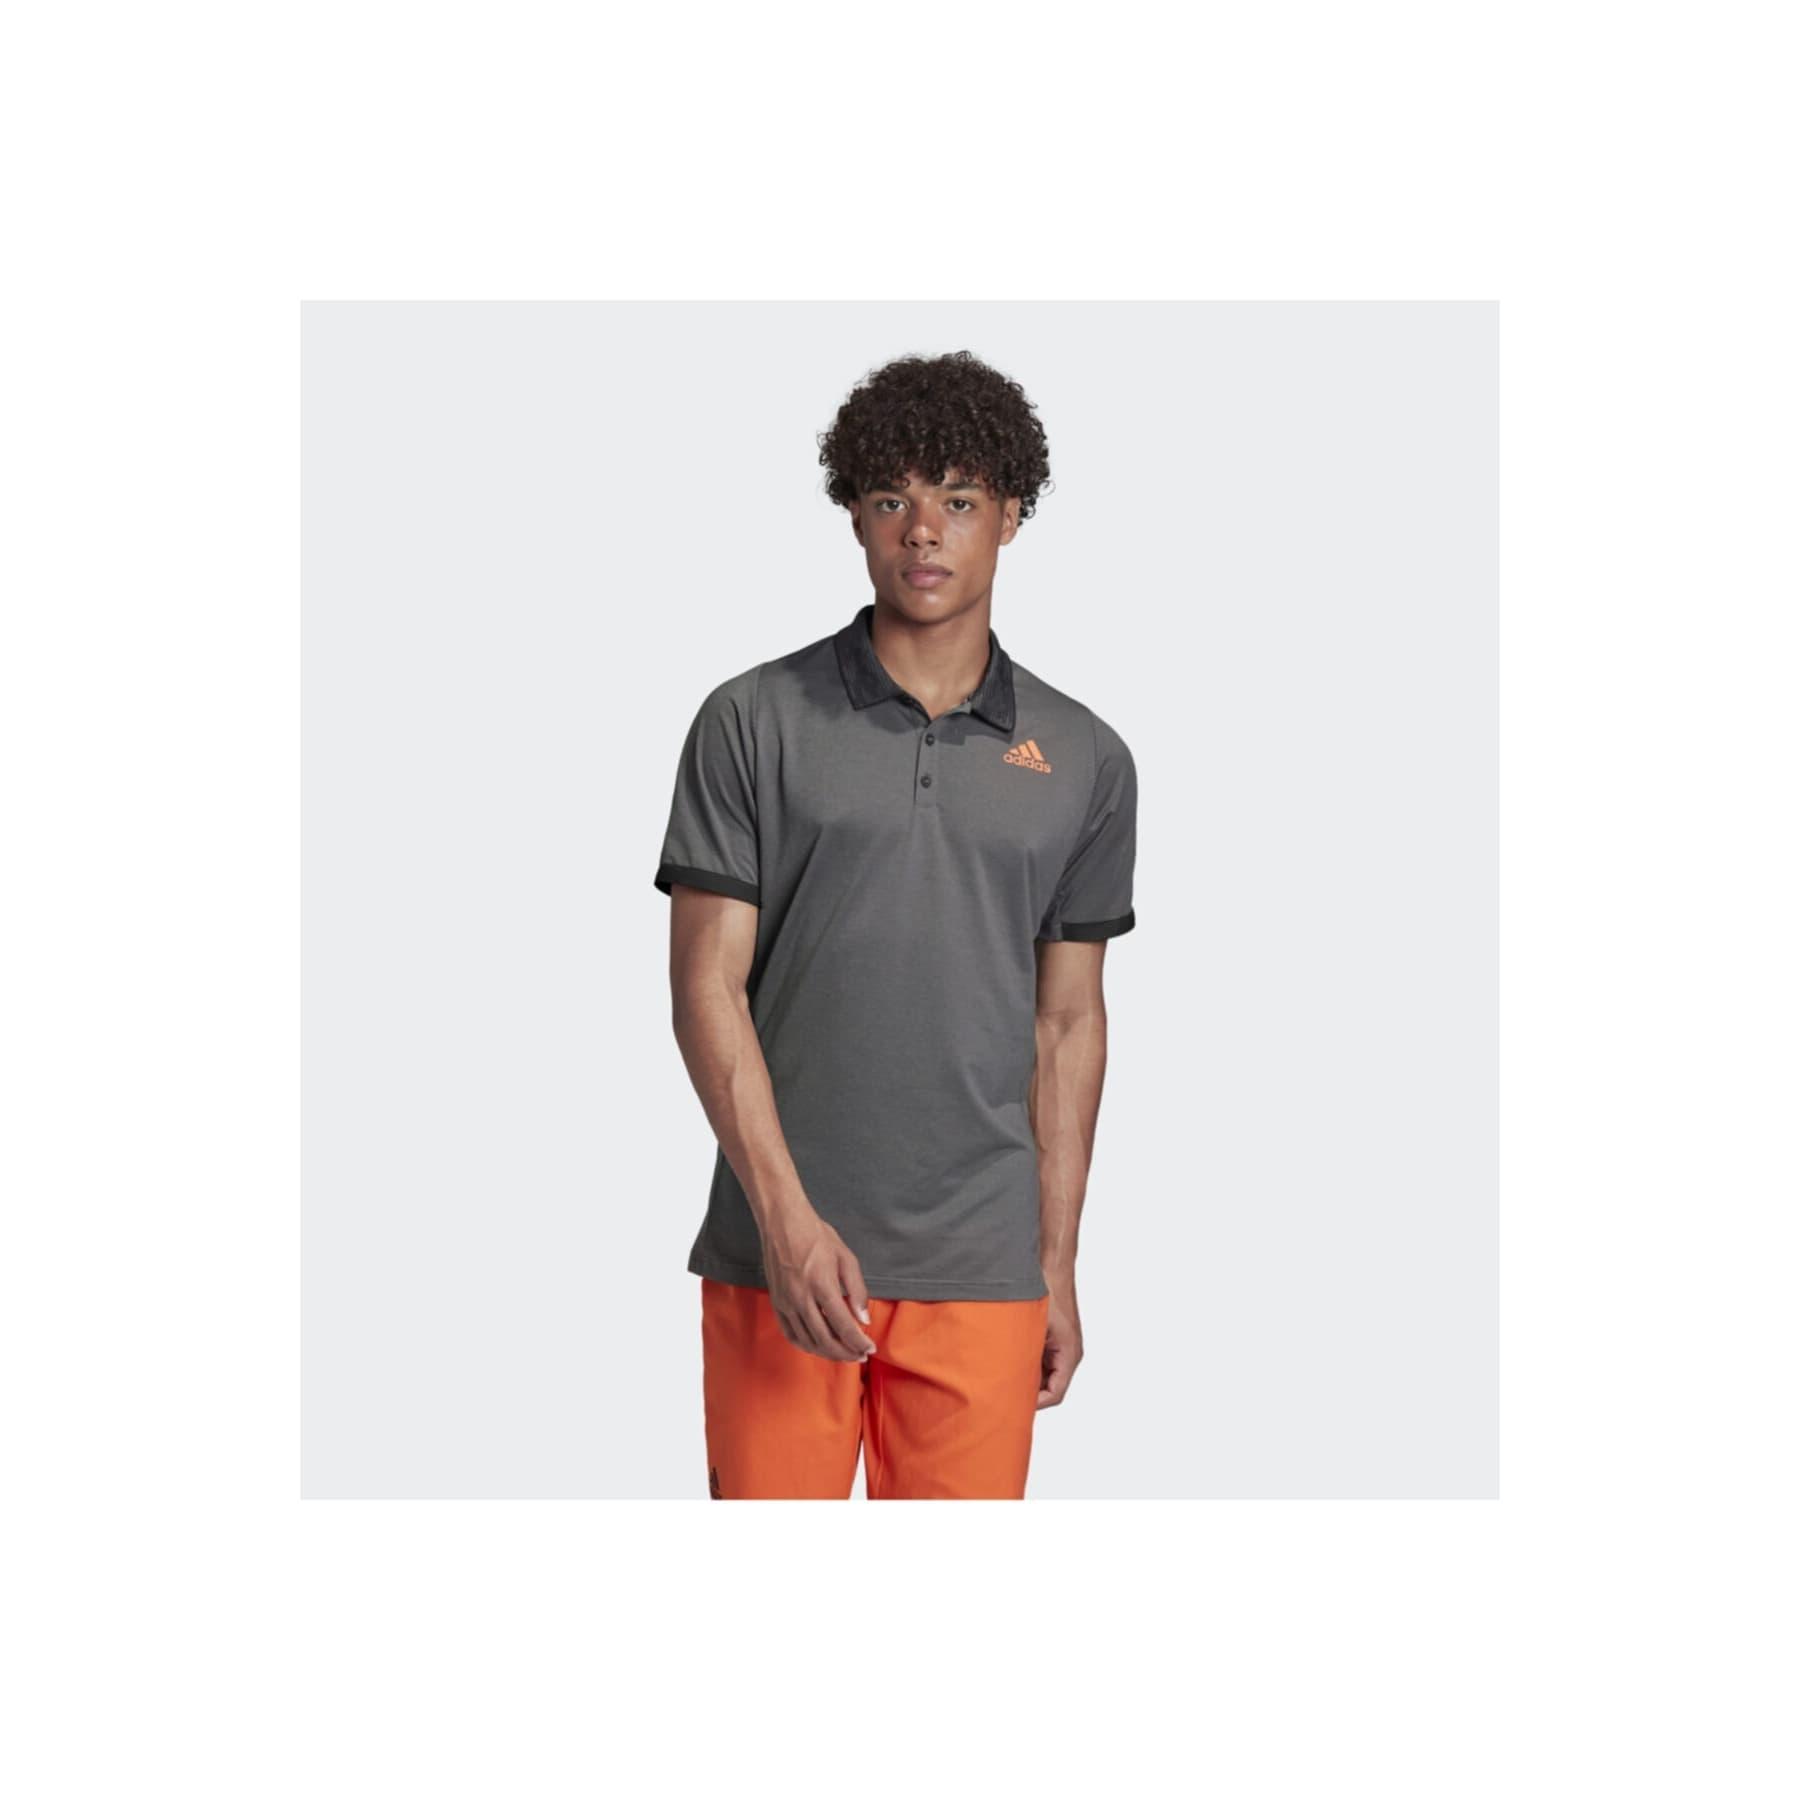 Freelift Primebluee Polo Yaka Tenis Tişörtü (FK0813)